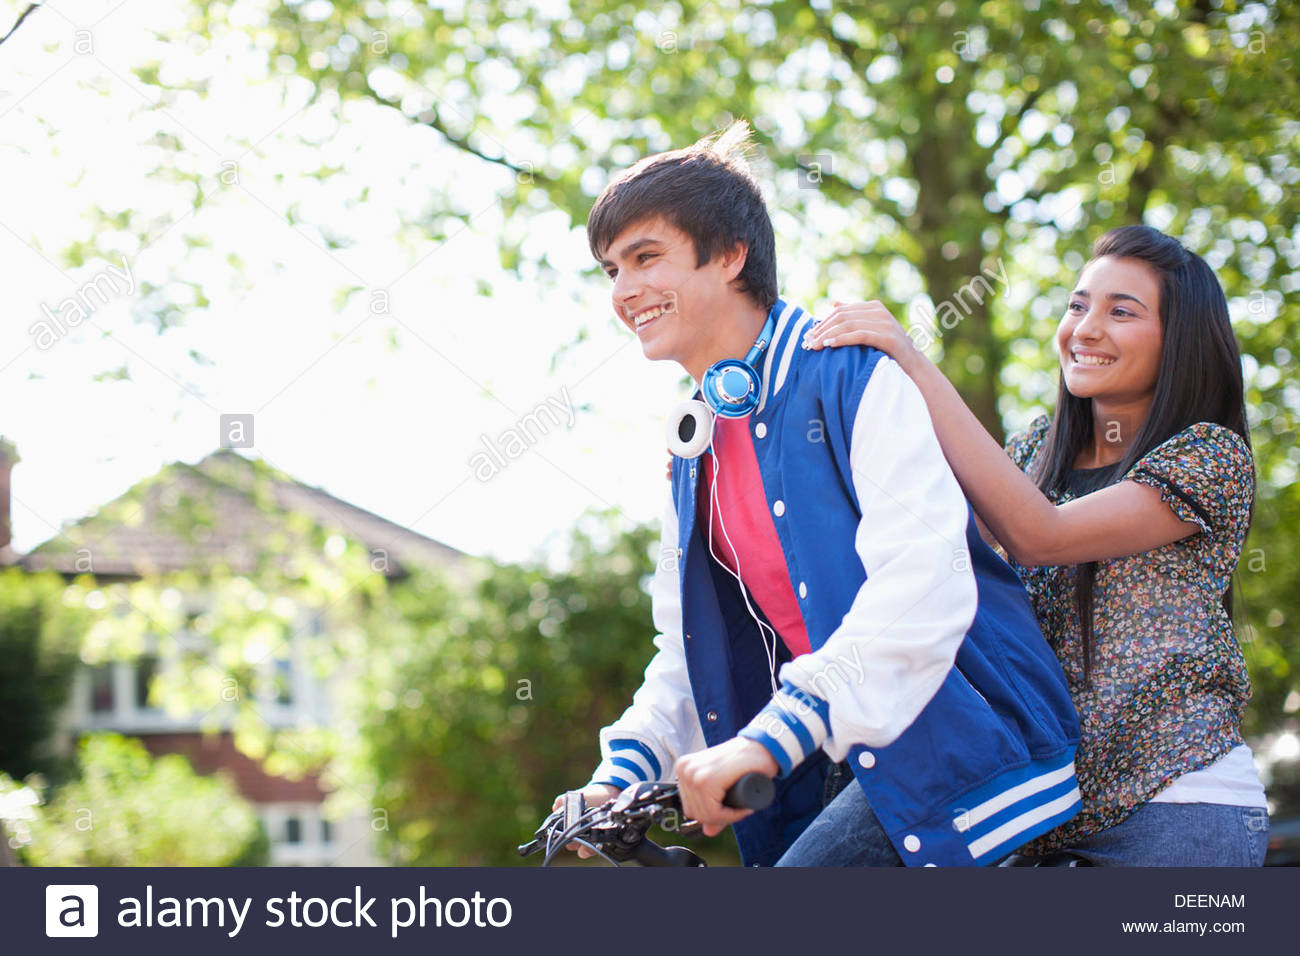 Adolescente novia montando en bicicleta Imagen De Stock